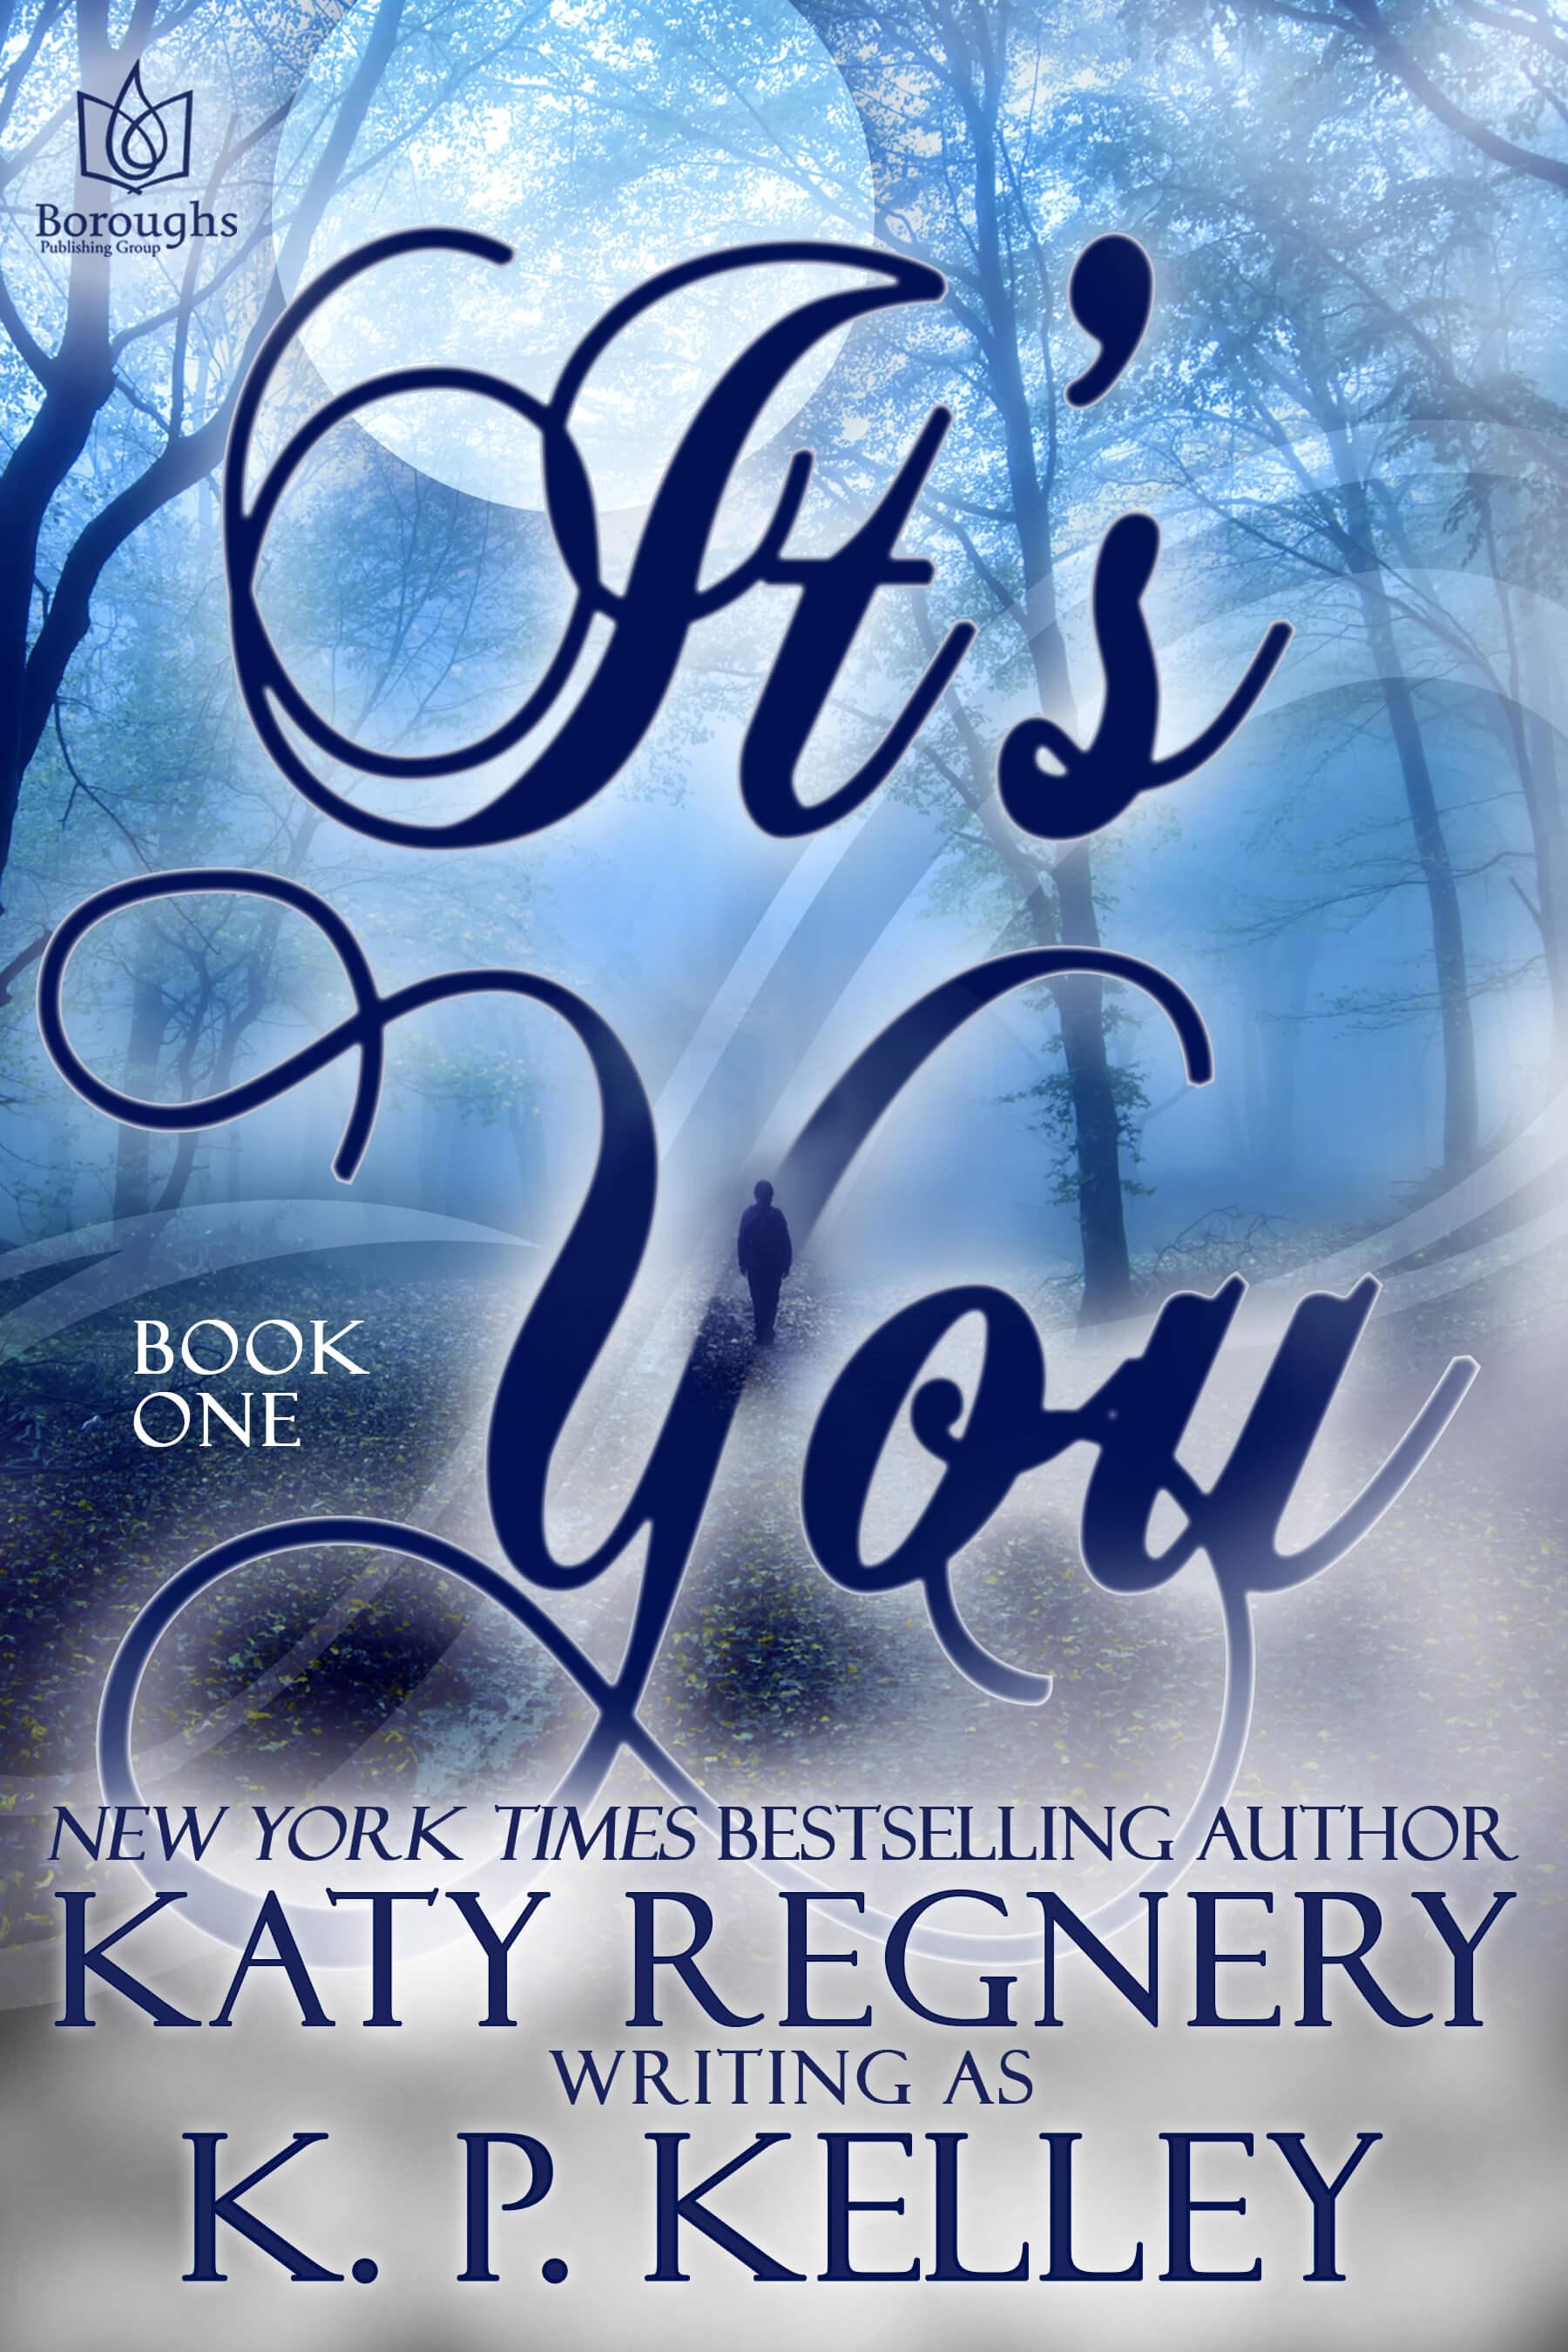 It's You part 1 by Katy Regnery, K.P. Kelley